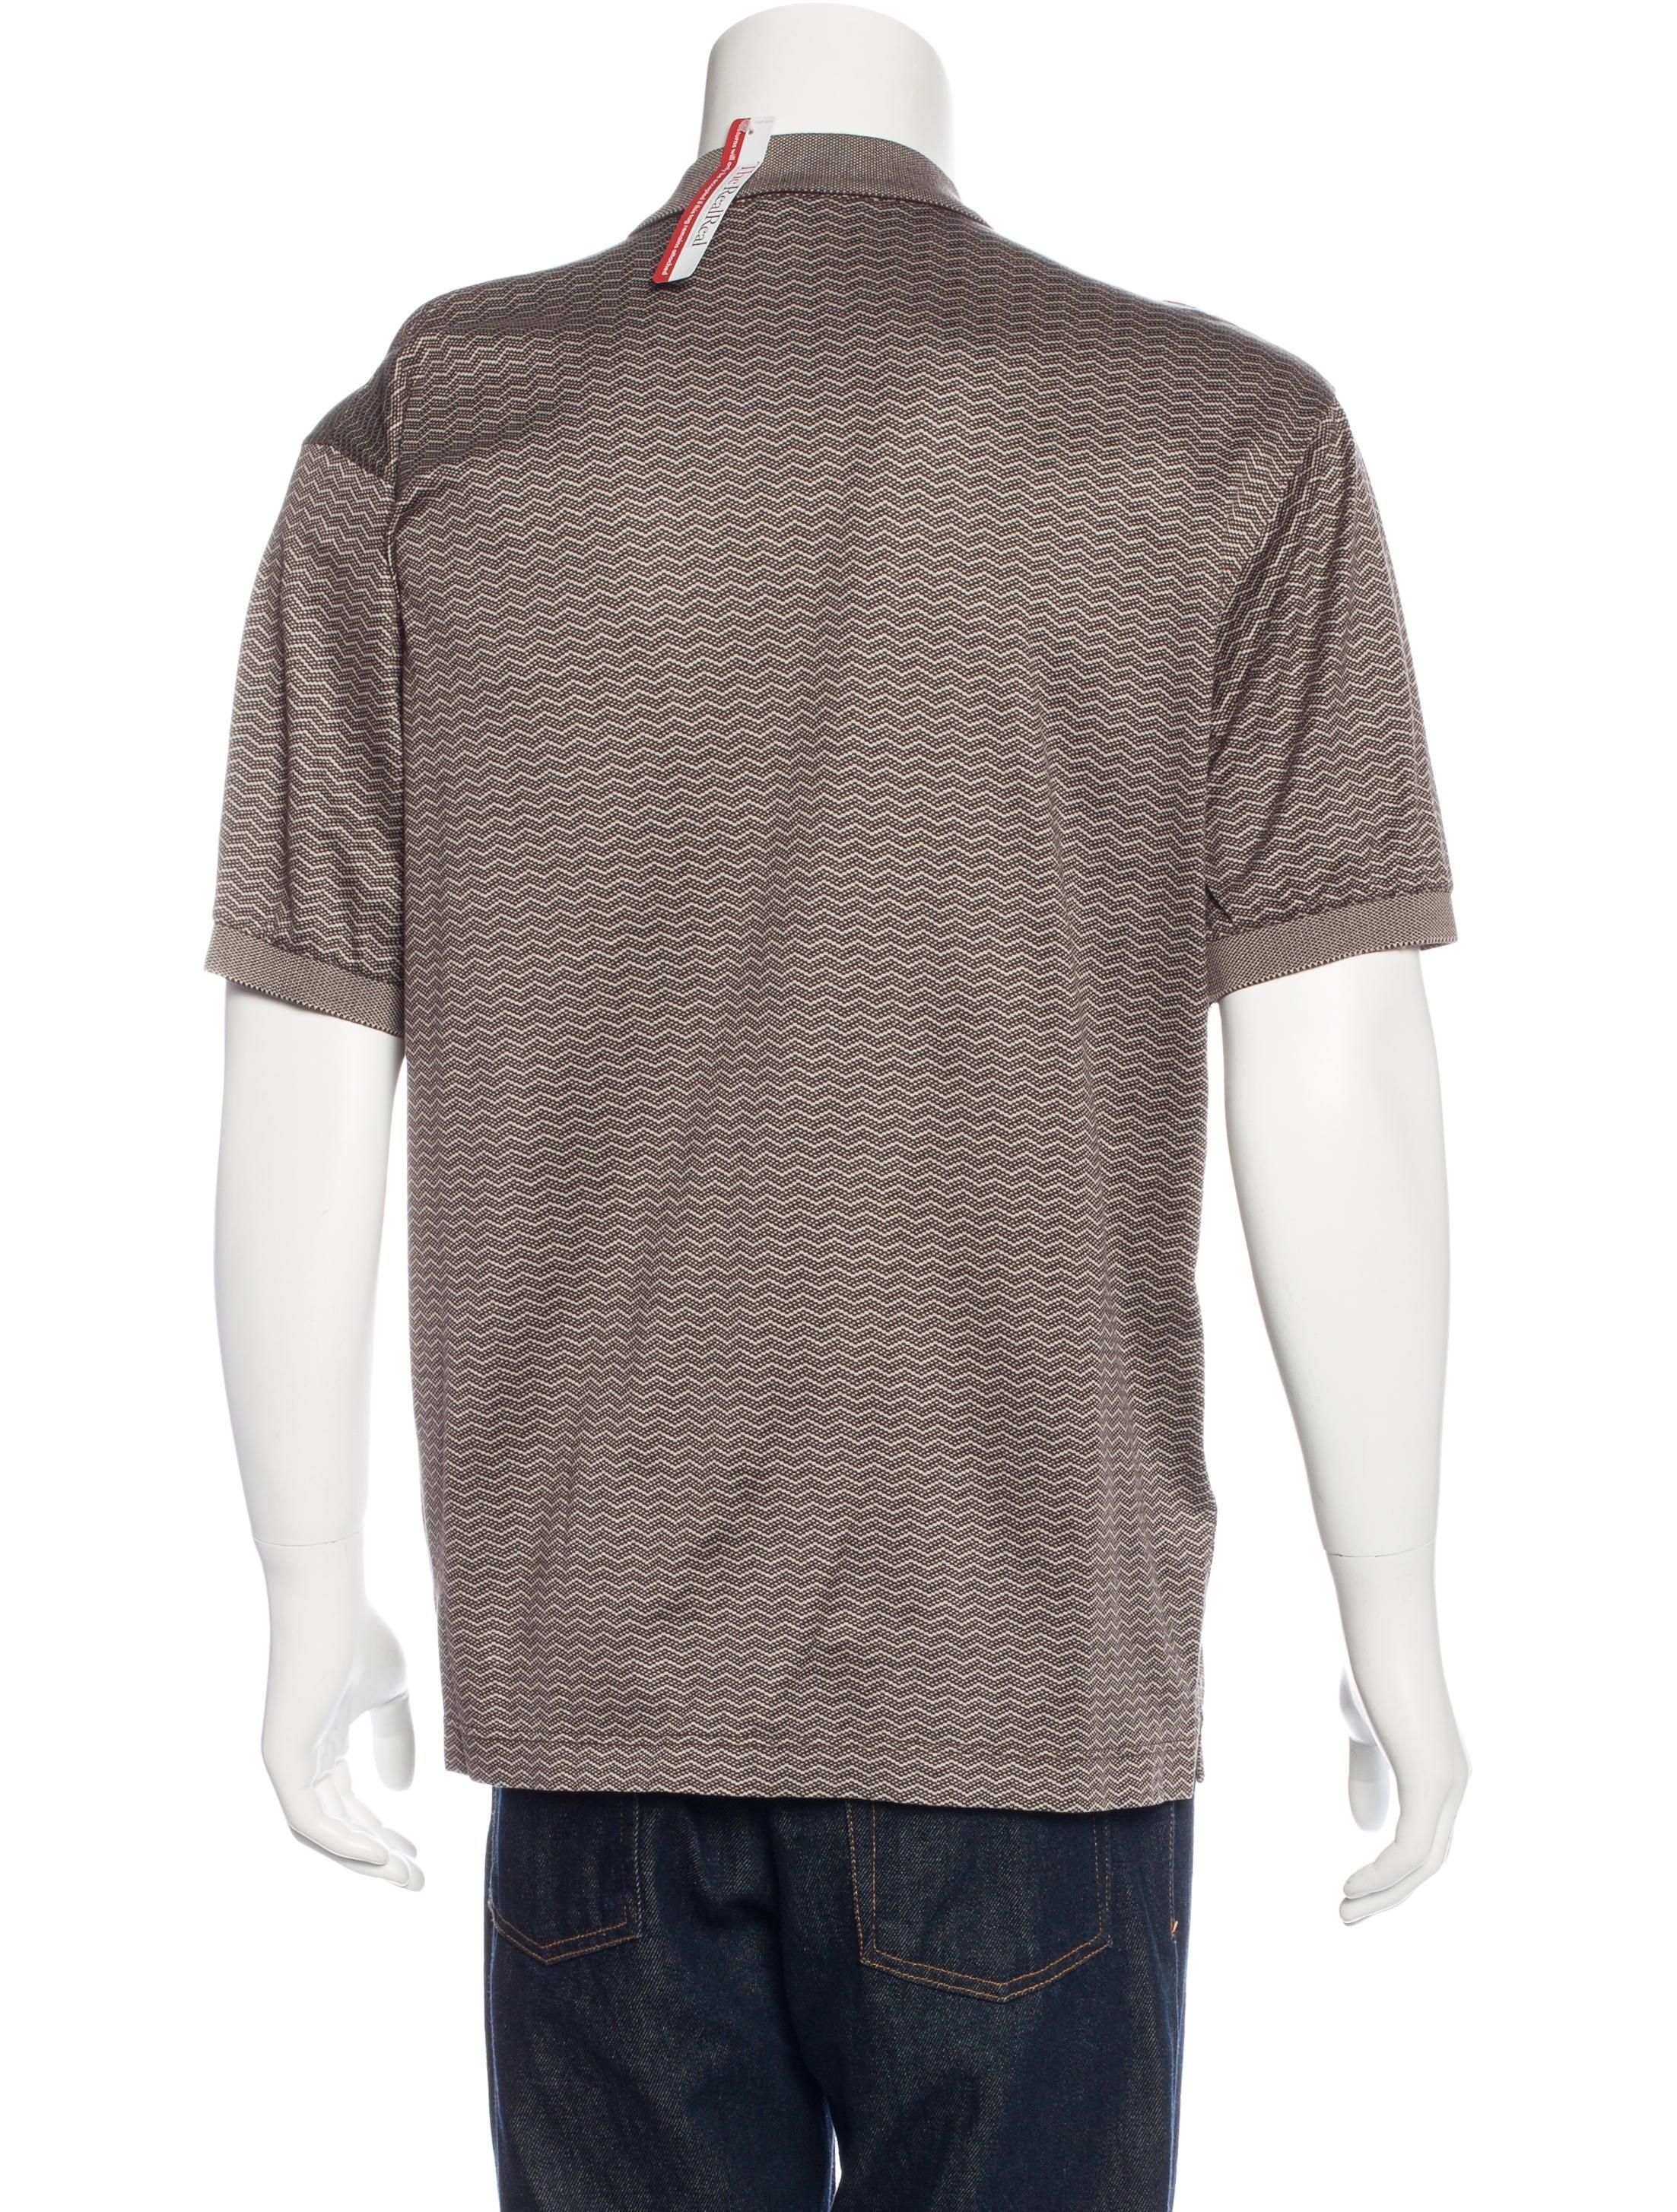 Ermenegildo zegna polo shirt clothing zgn24553 the for Zegna polo shirts sale